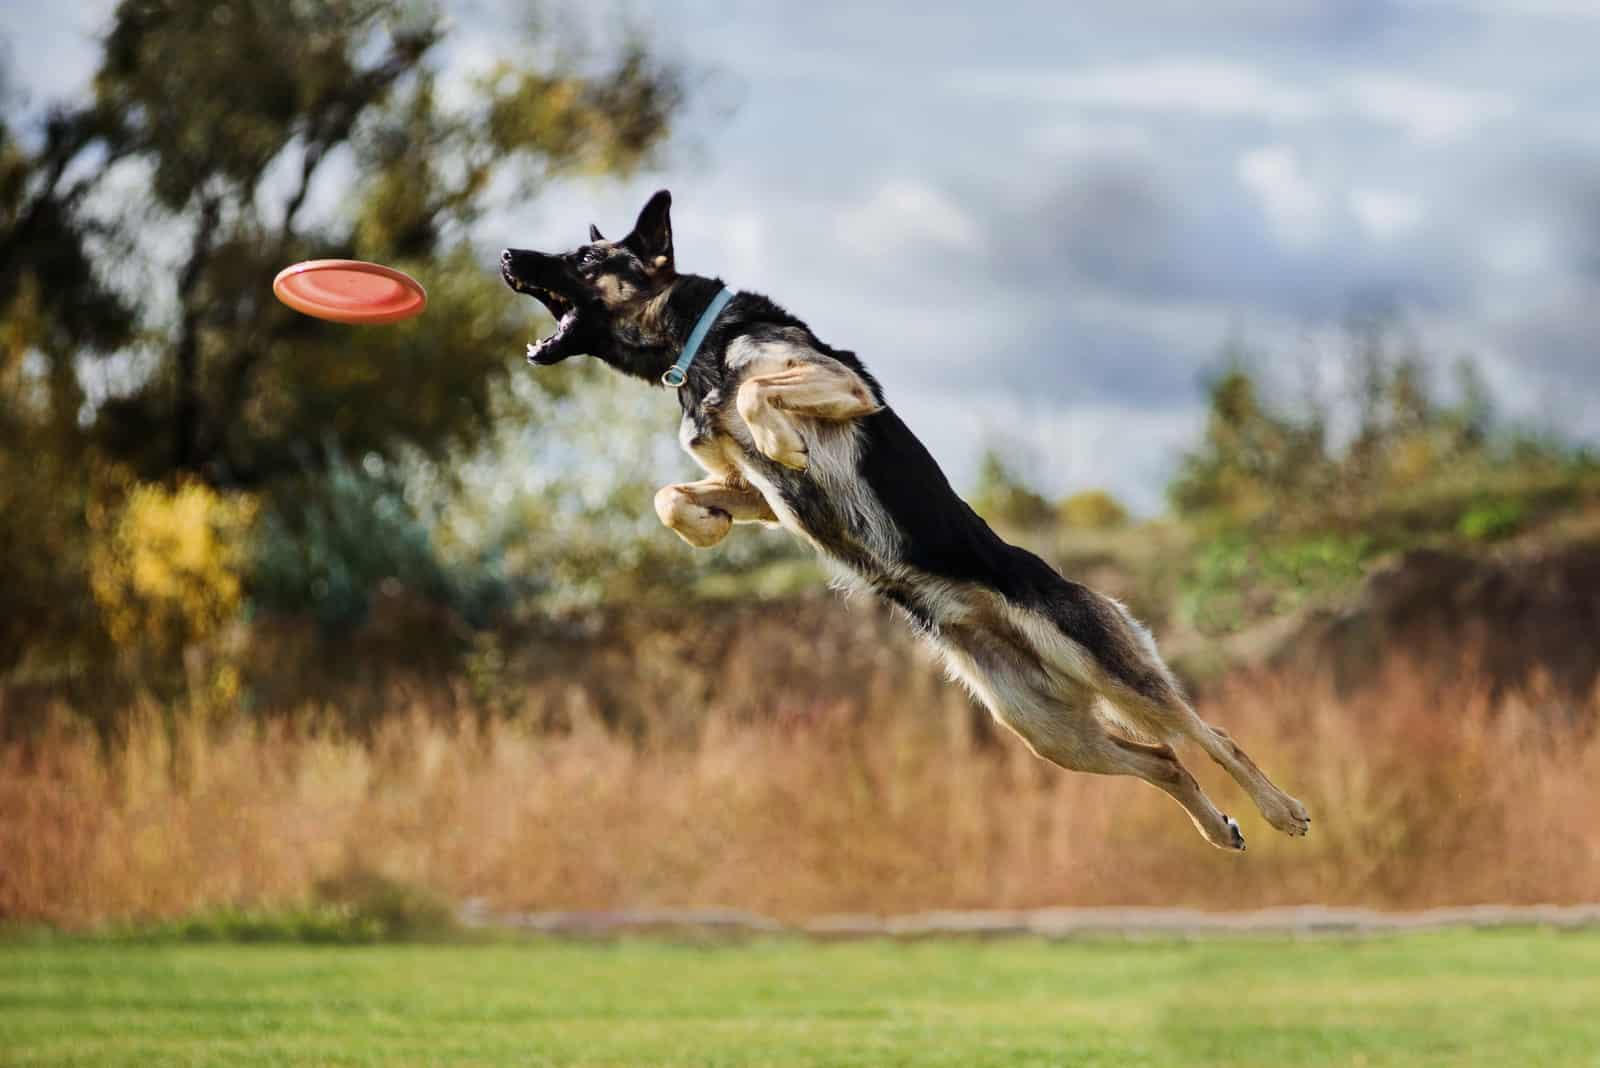 a German Shepherd catches a frisbee